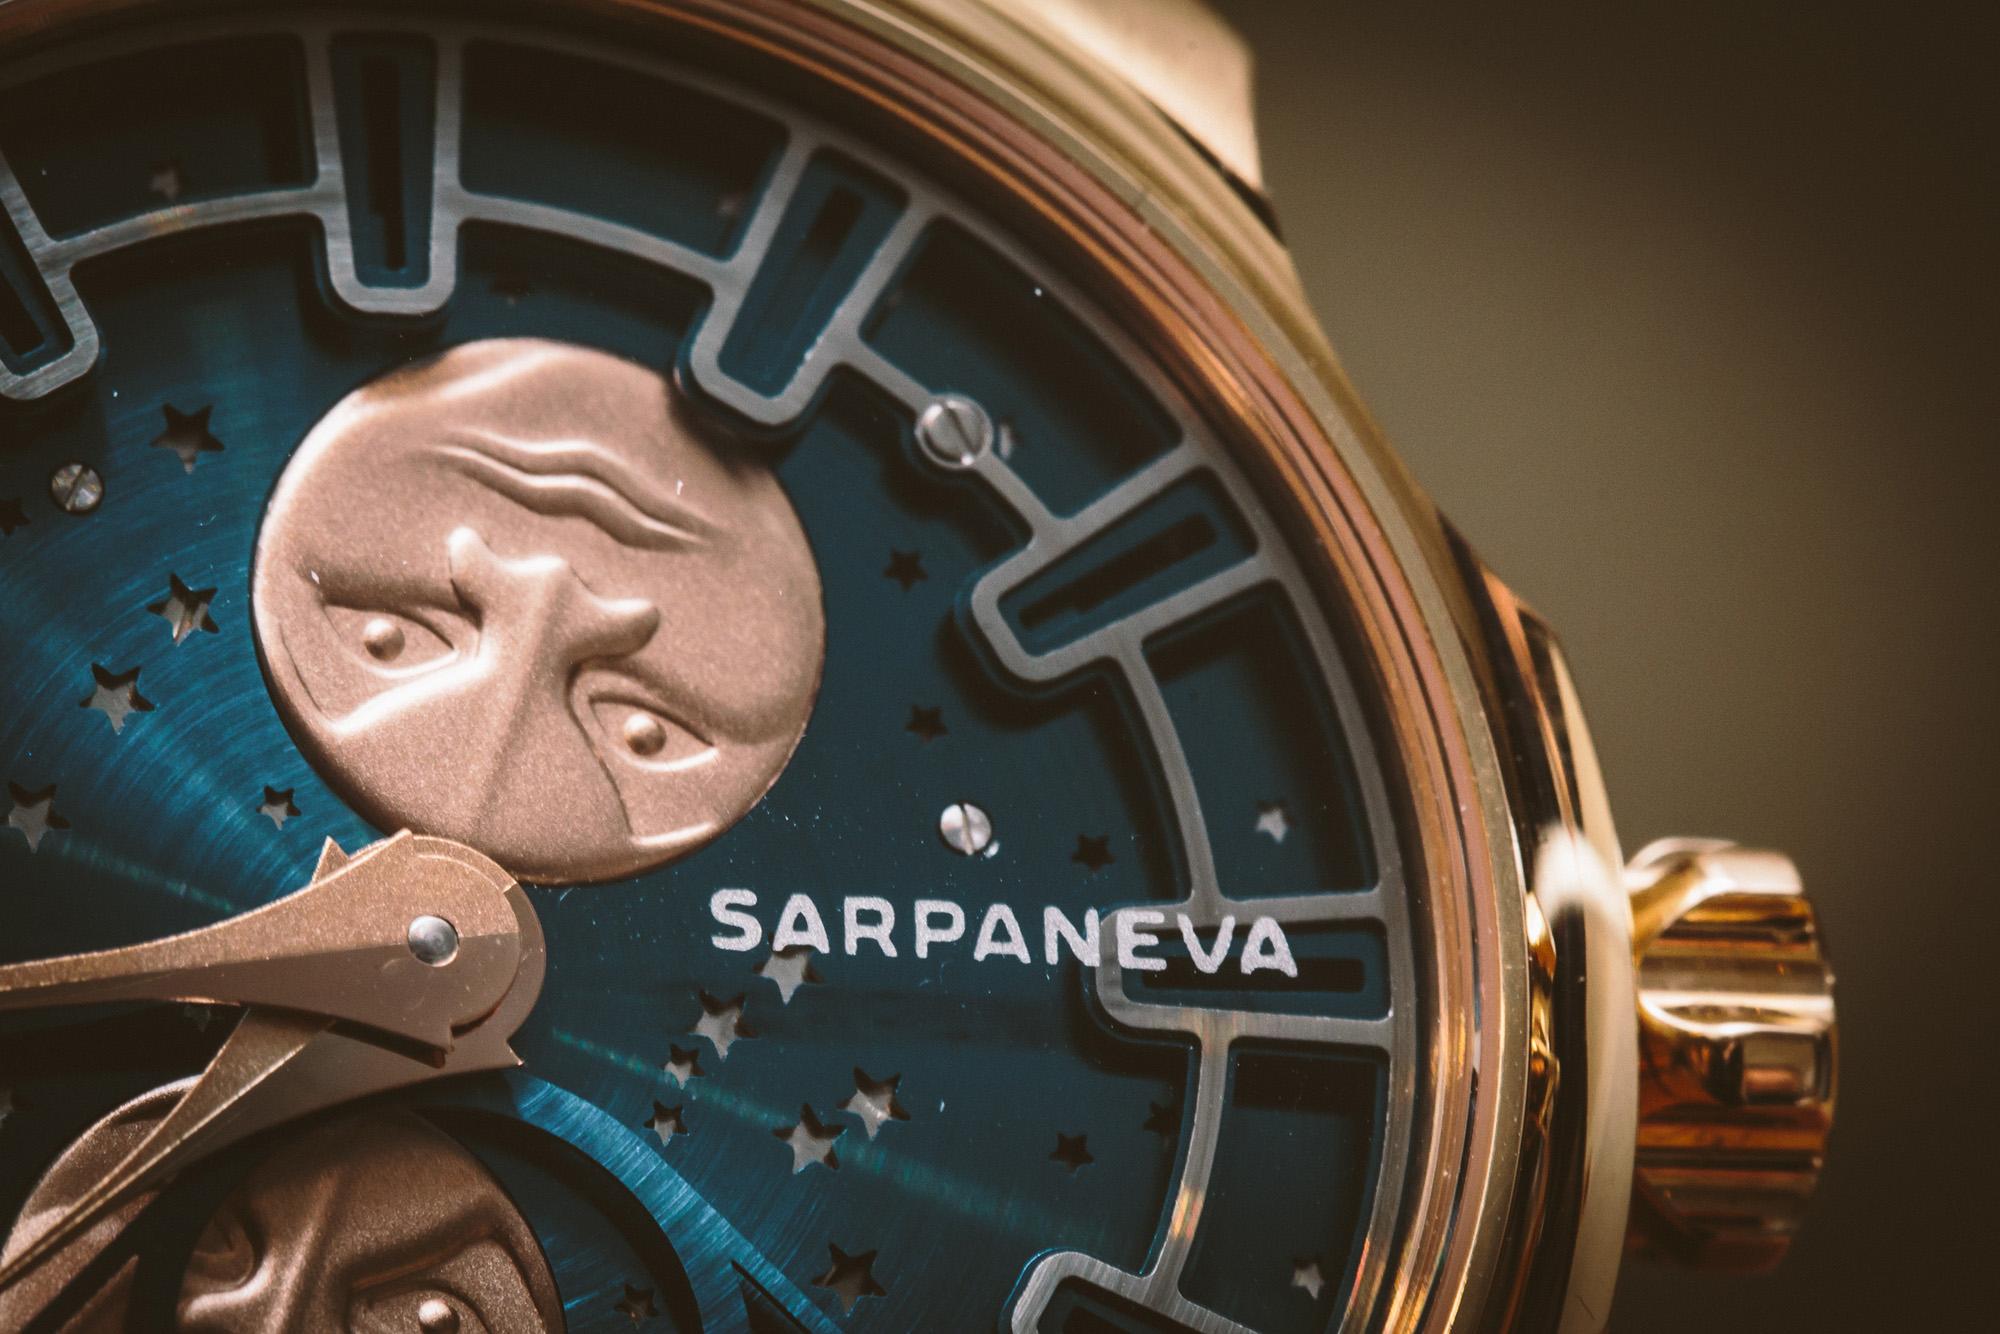 Sarpaneva Korona K3 Northern Stars